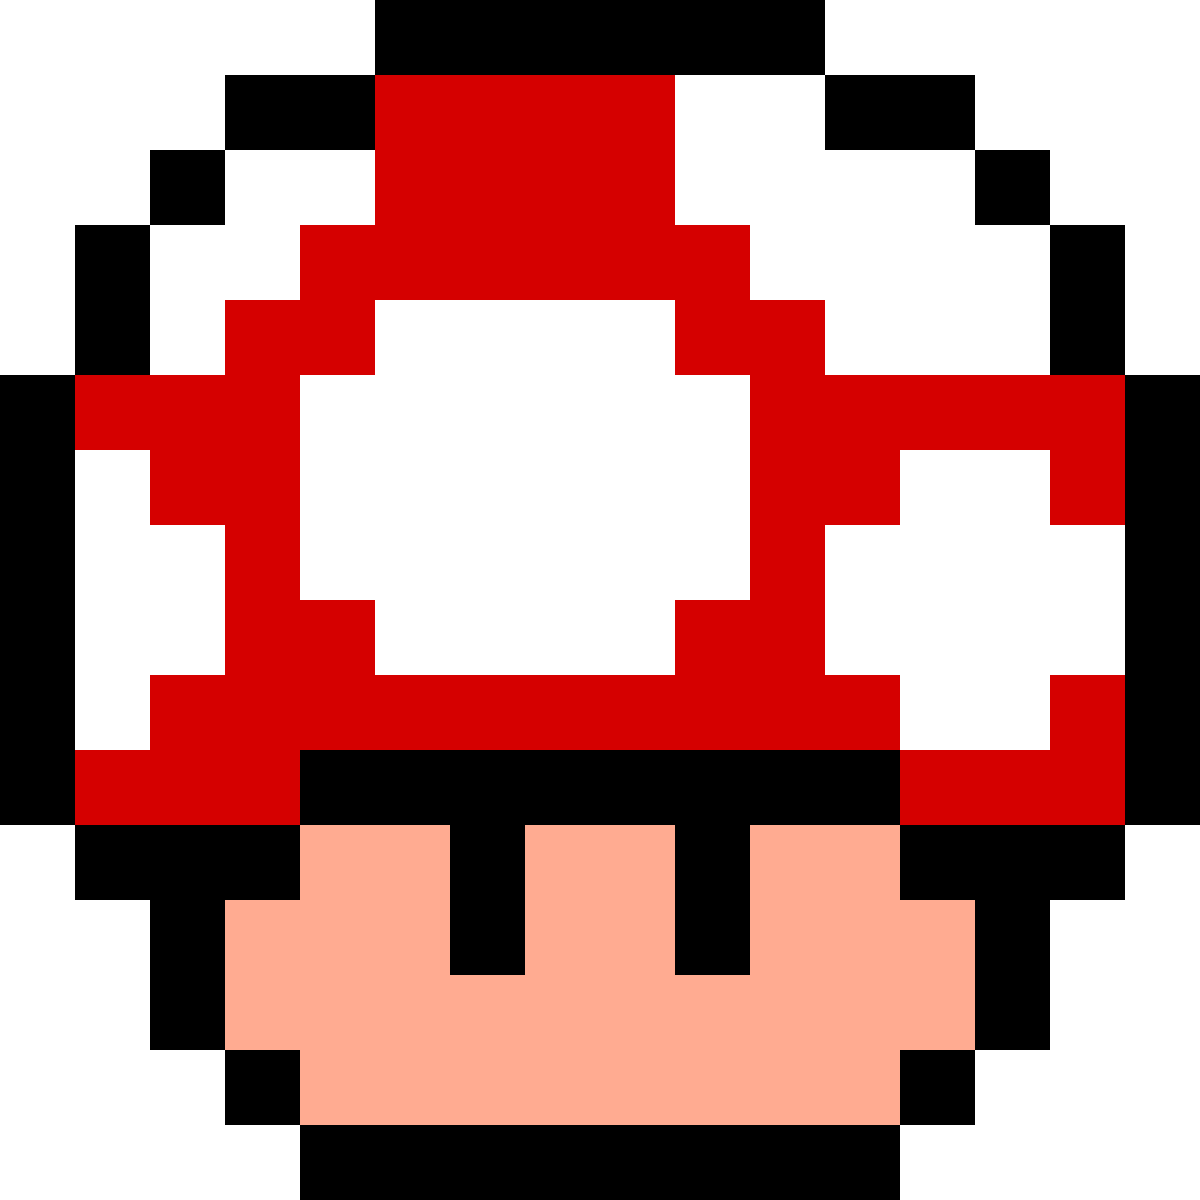 Download Super Mario Mushroom Pixel Mario Mushroom Gif Full